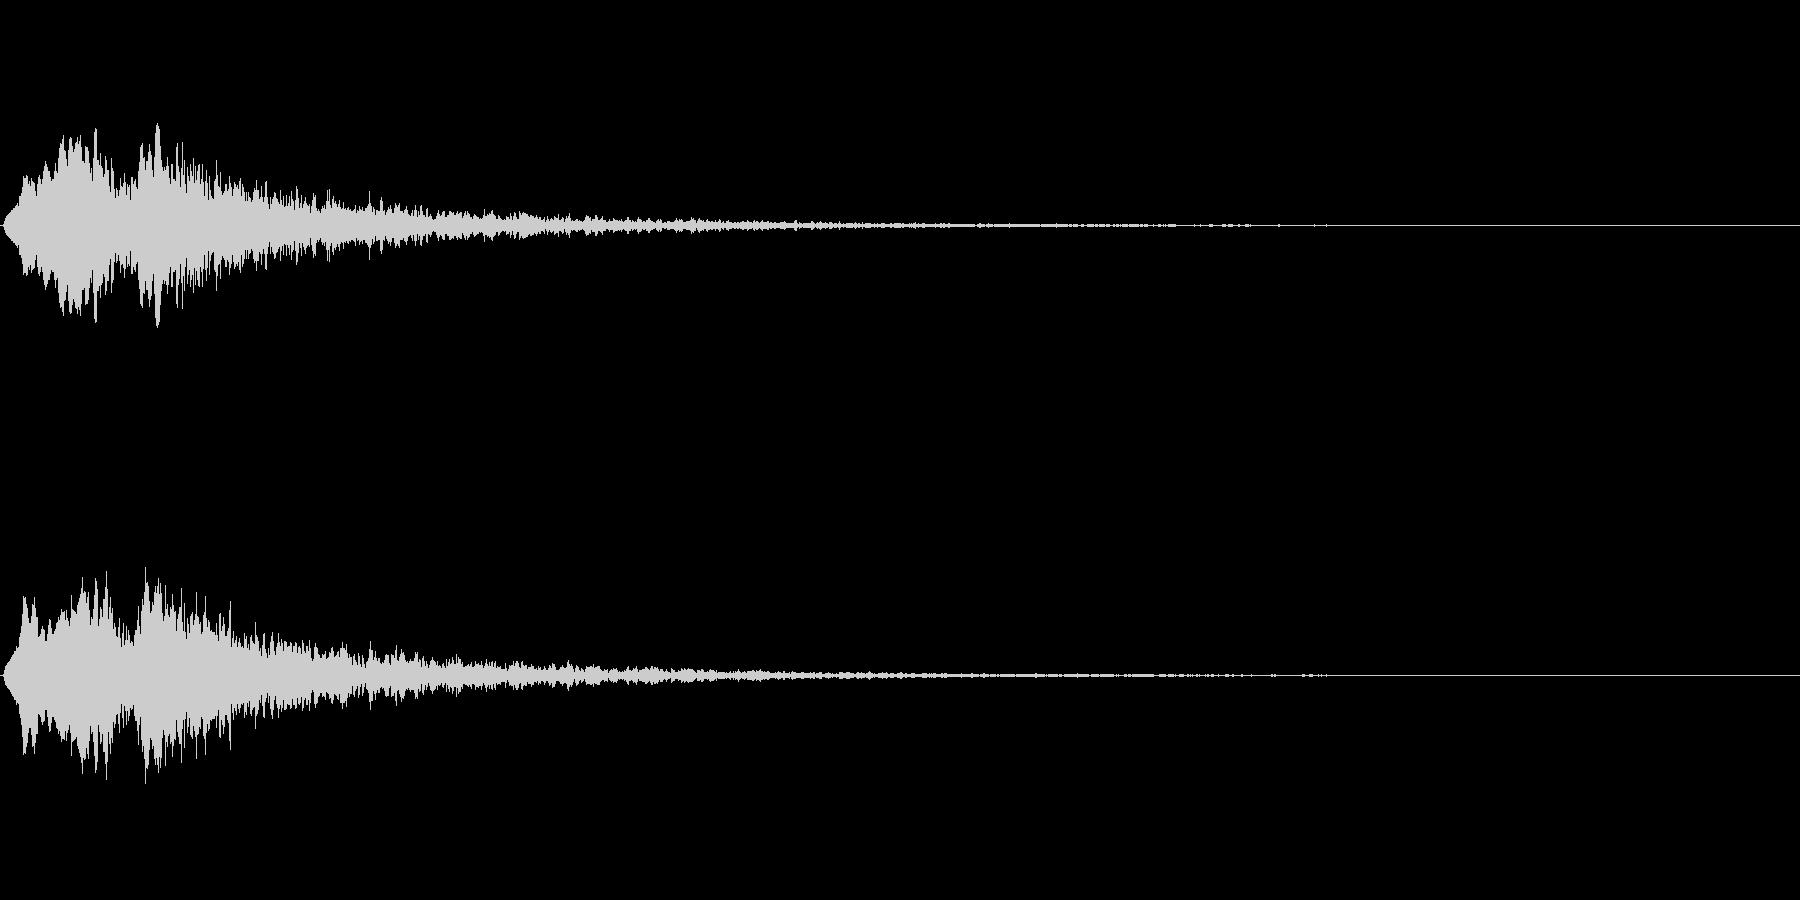 Vox 不気味な鳴き声 ホラーSE 4の未再生の波形